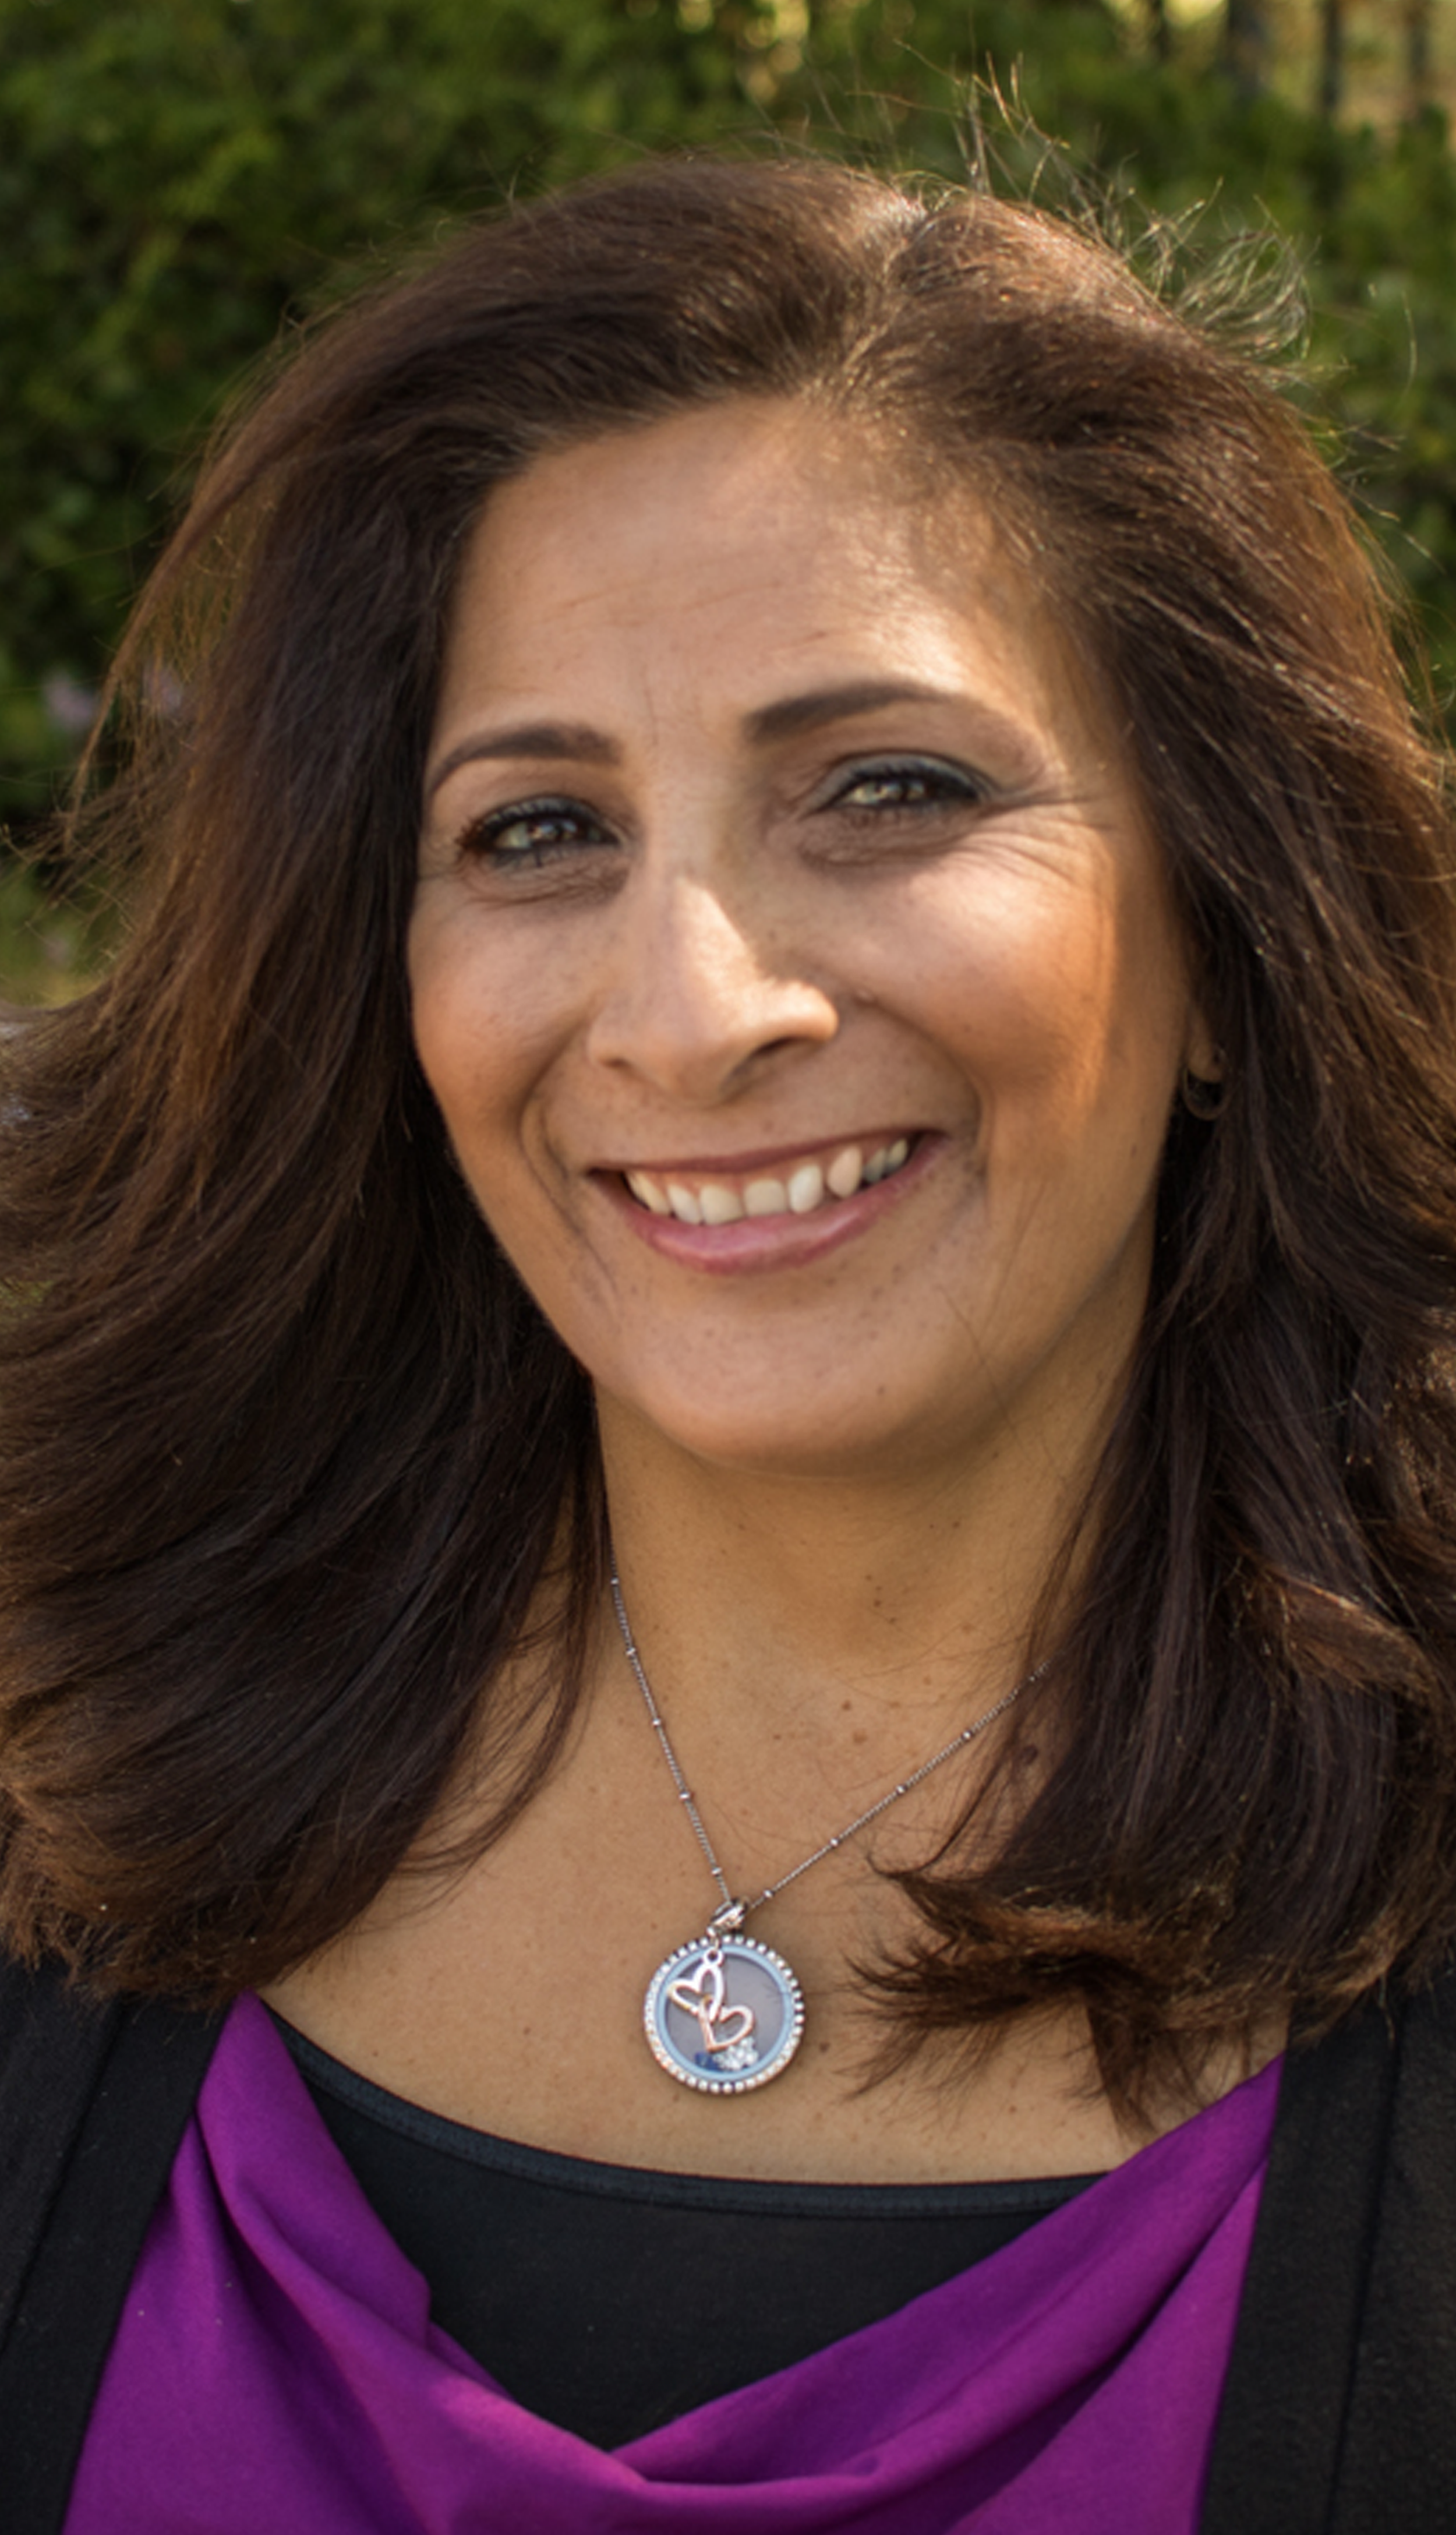 Veronica Avila Bookstore Director